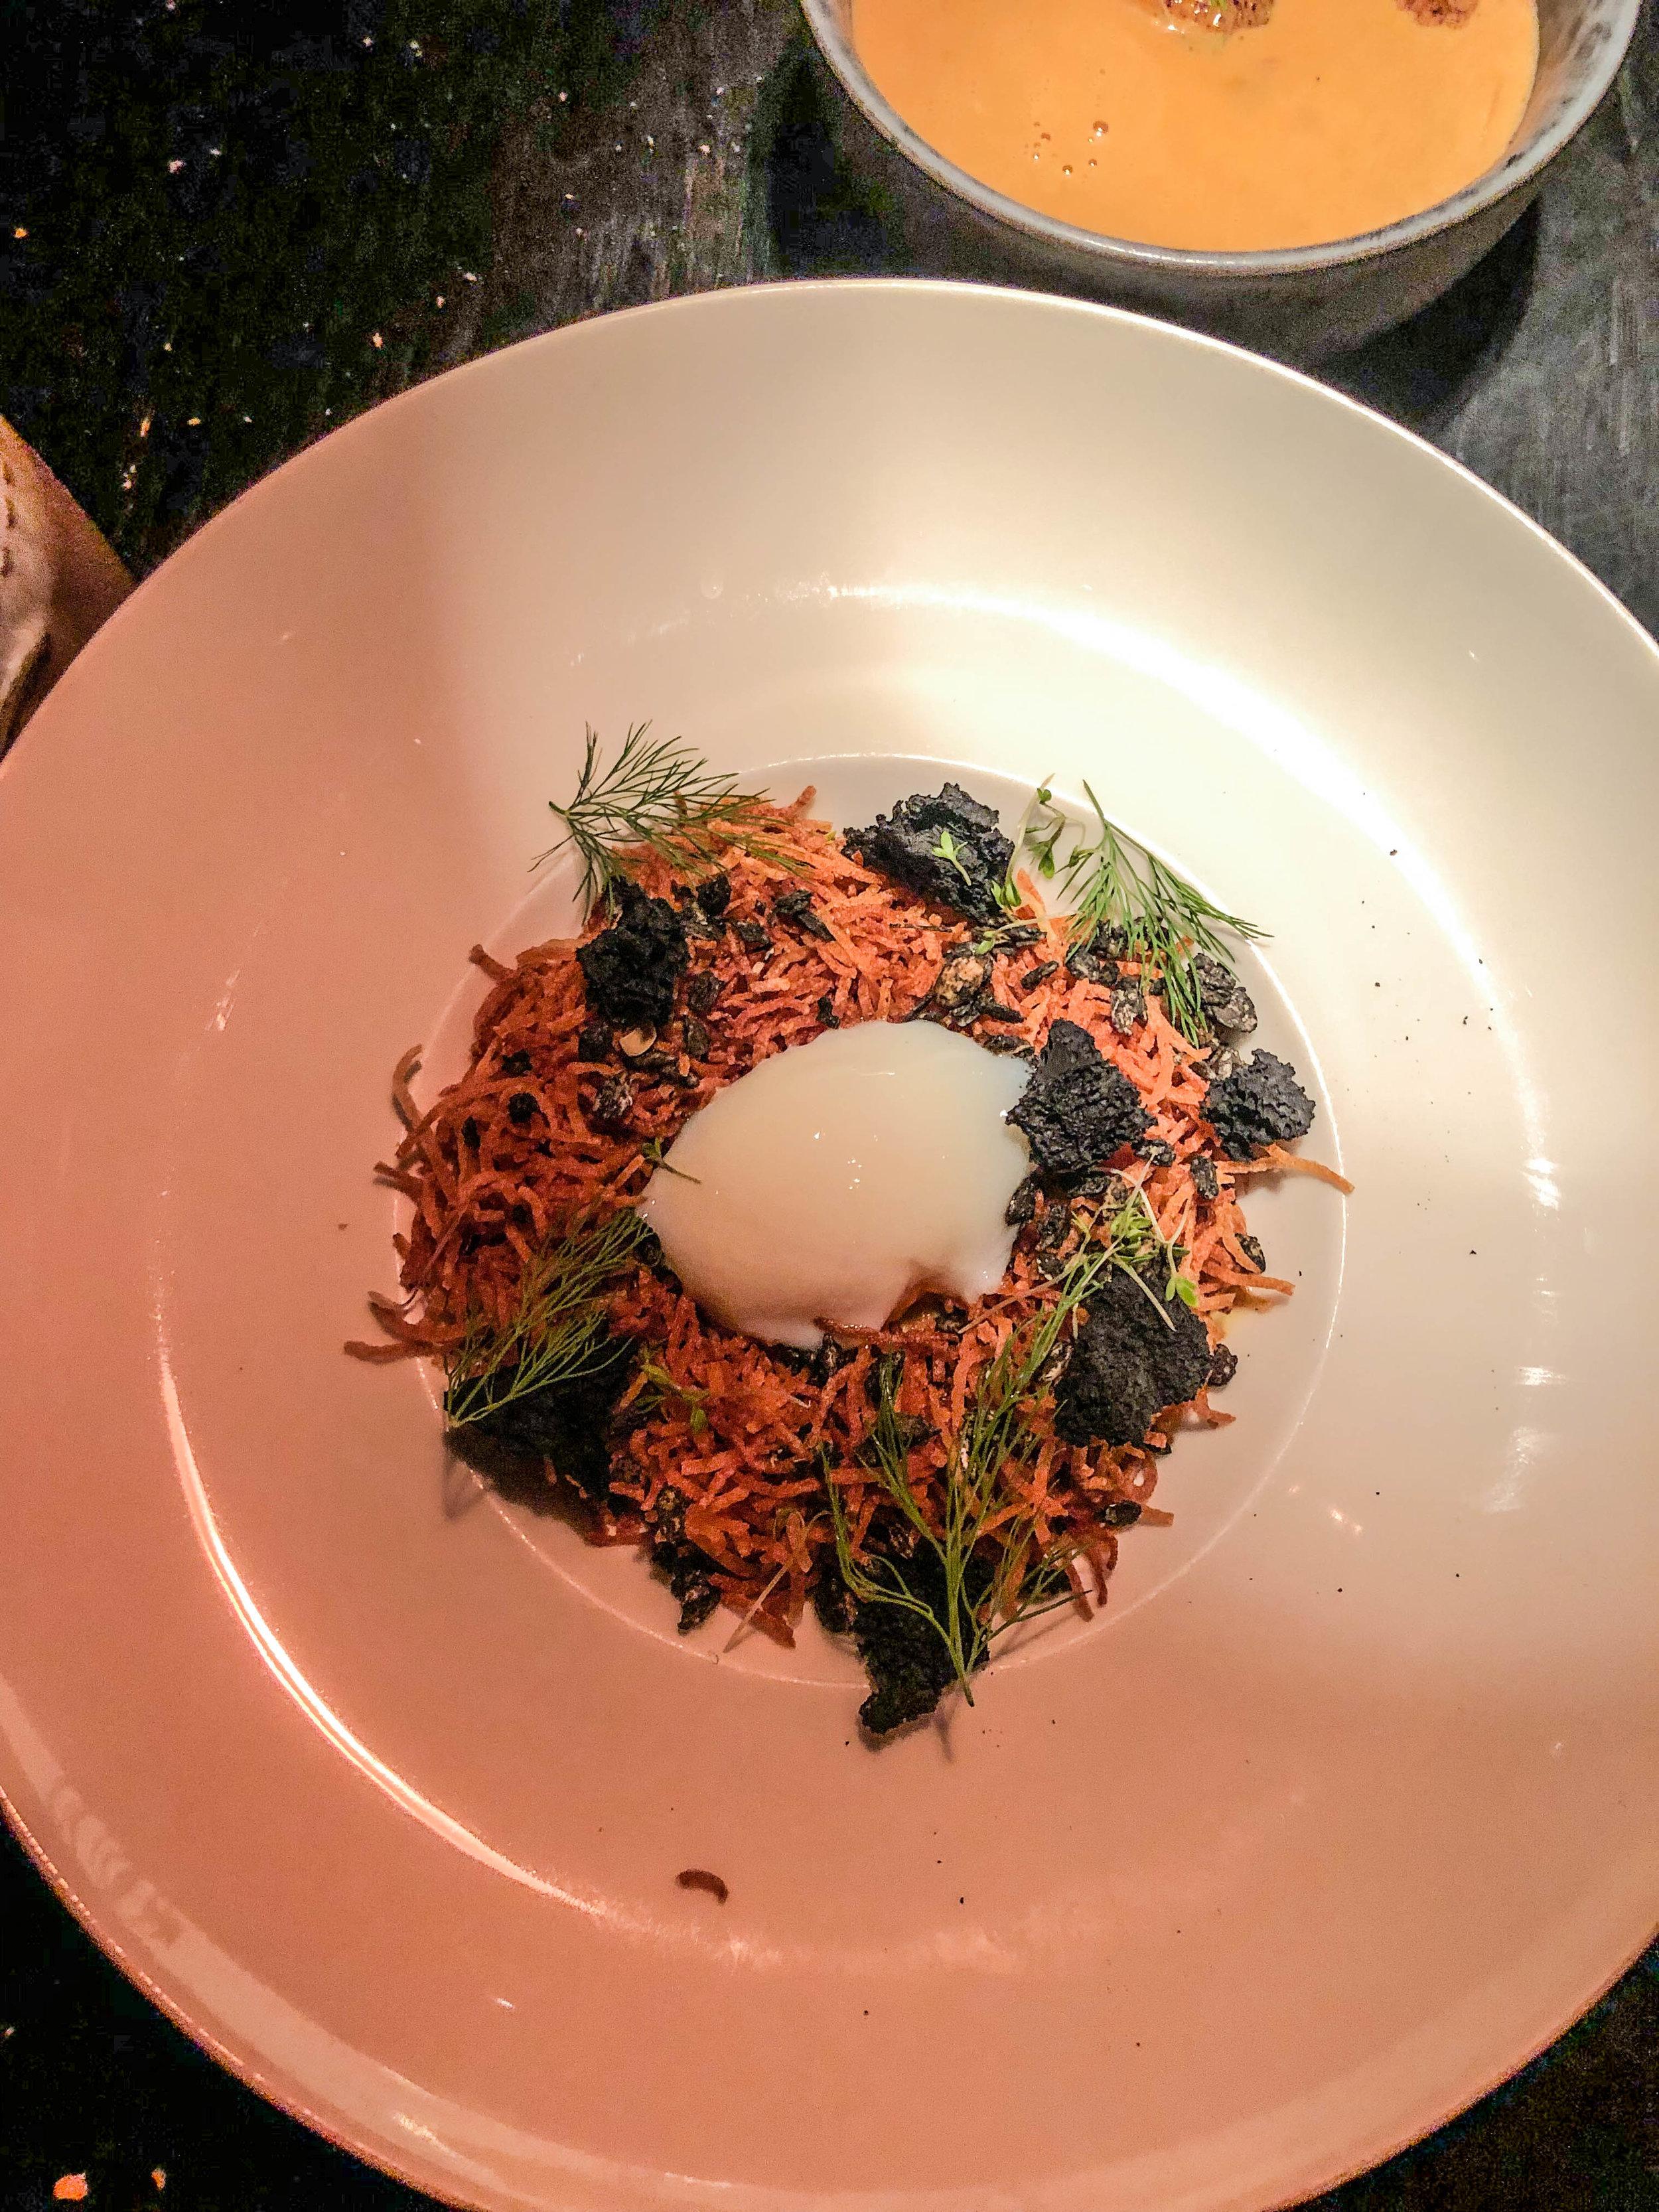 FRANCE - TRUFFLES ~ 65°C egg in a crispy POTATO NEST with truffle purée & green ASPARAGUS, fried wild mushrooms & wild herb GRANOLA